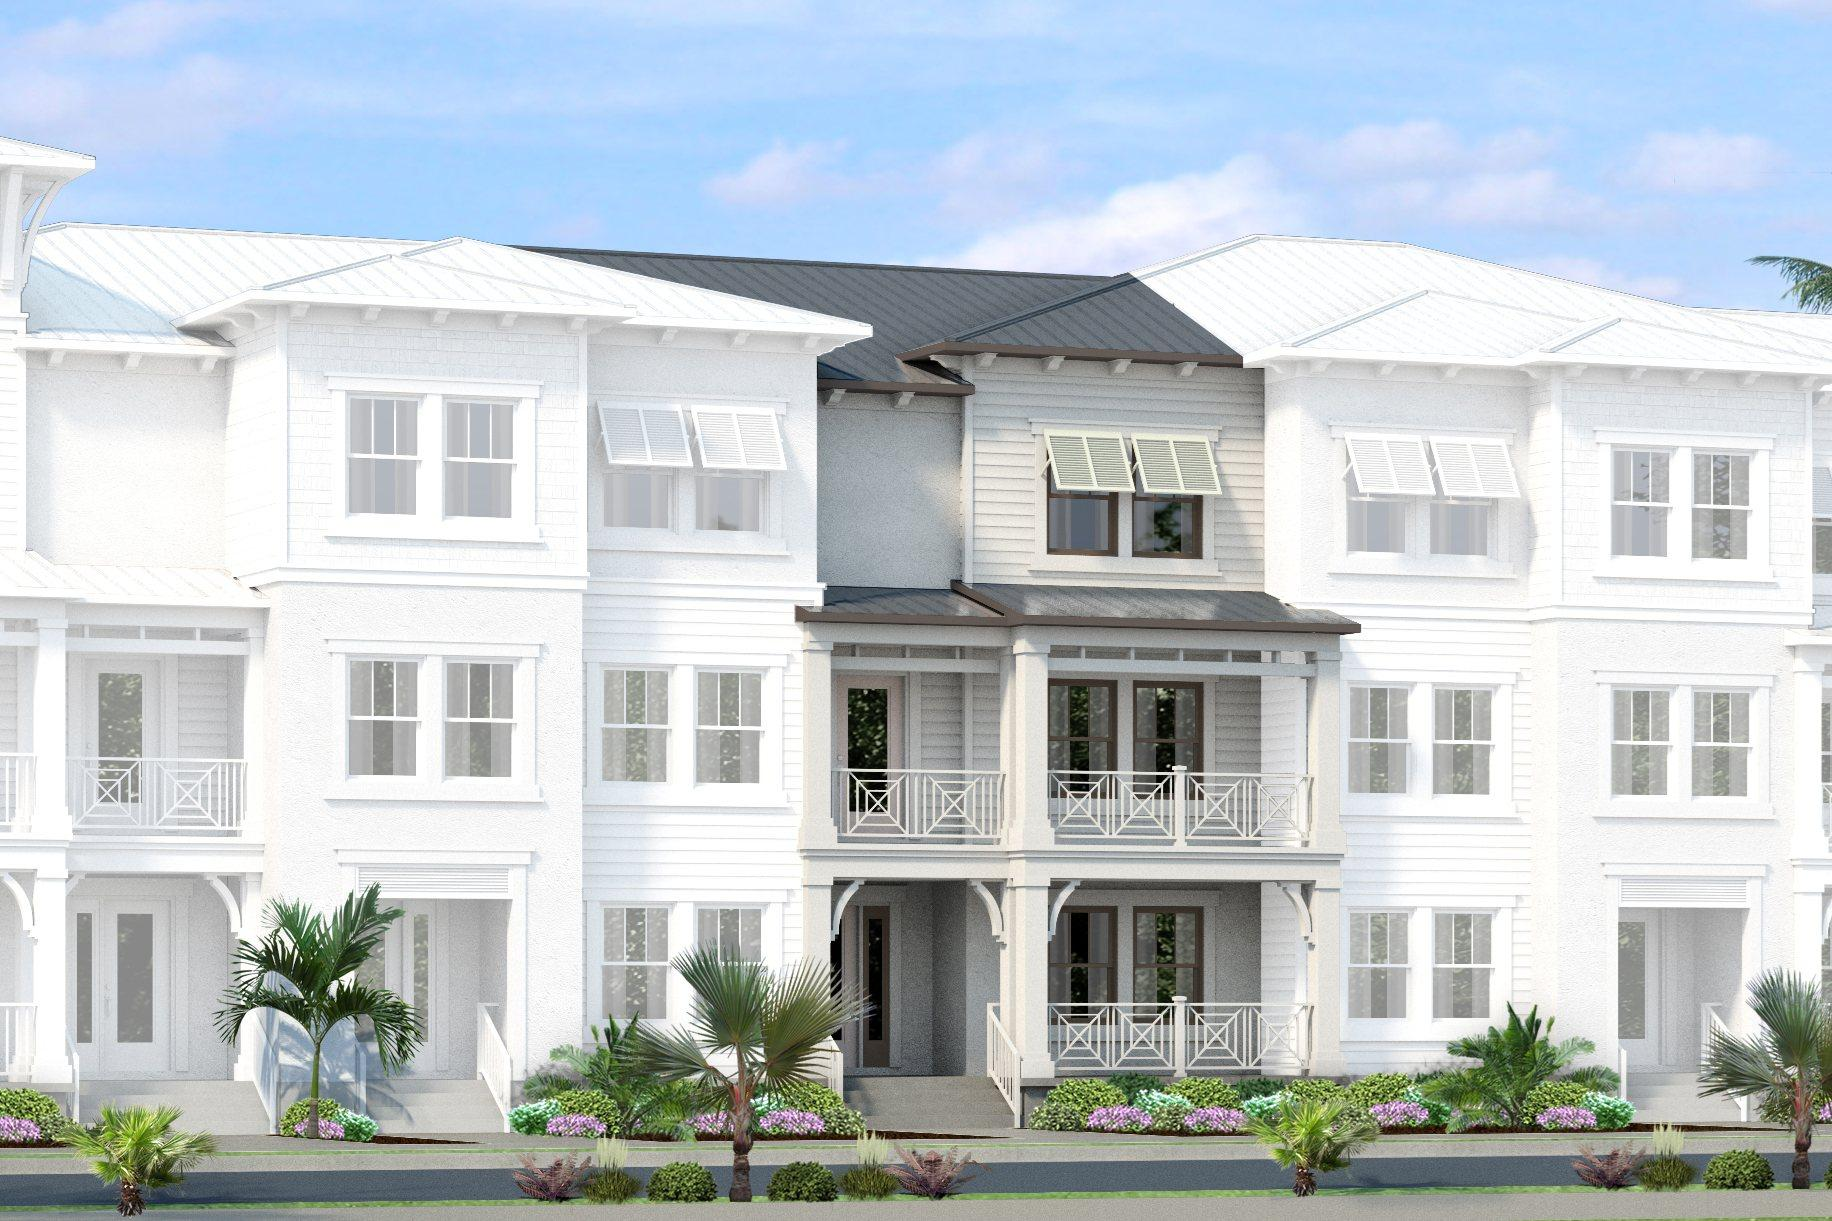 Pleasant 4921 W Paul Ave 5 Tampa Fl 33611 3 Bed 3 5 Bath Download Free Architecture Designs Intelgarnamadebymaigaardcom